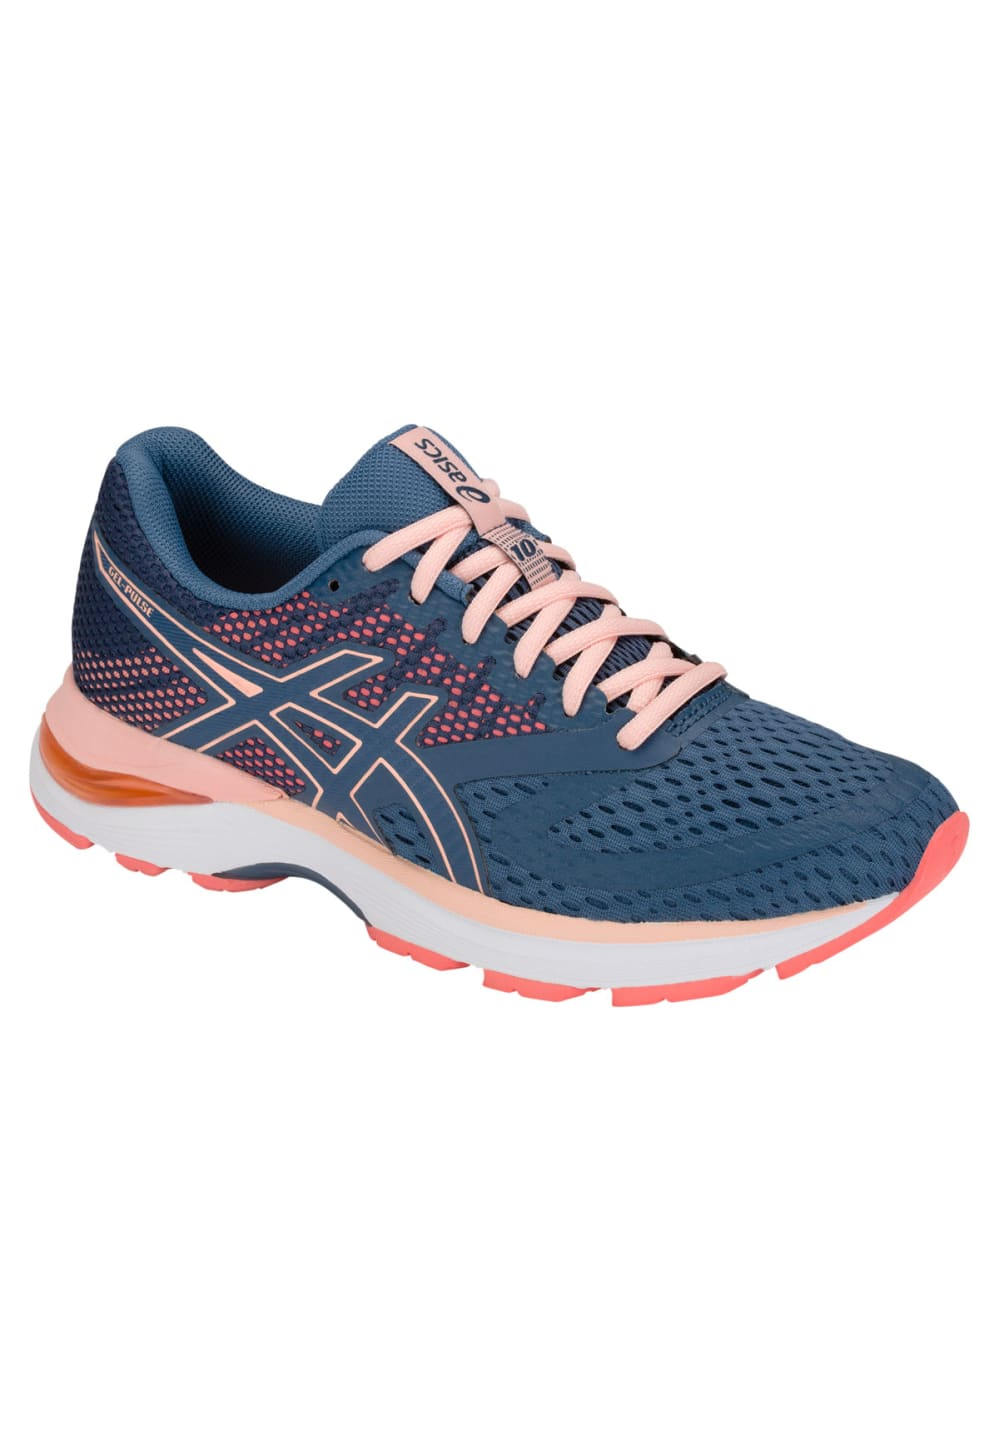 ASICS GEL-Pulse 10 - Laufschuhe für Damen - Blau